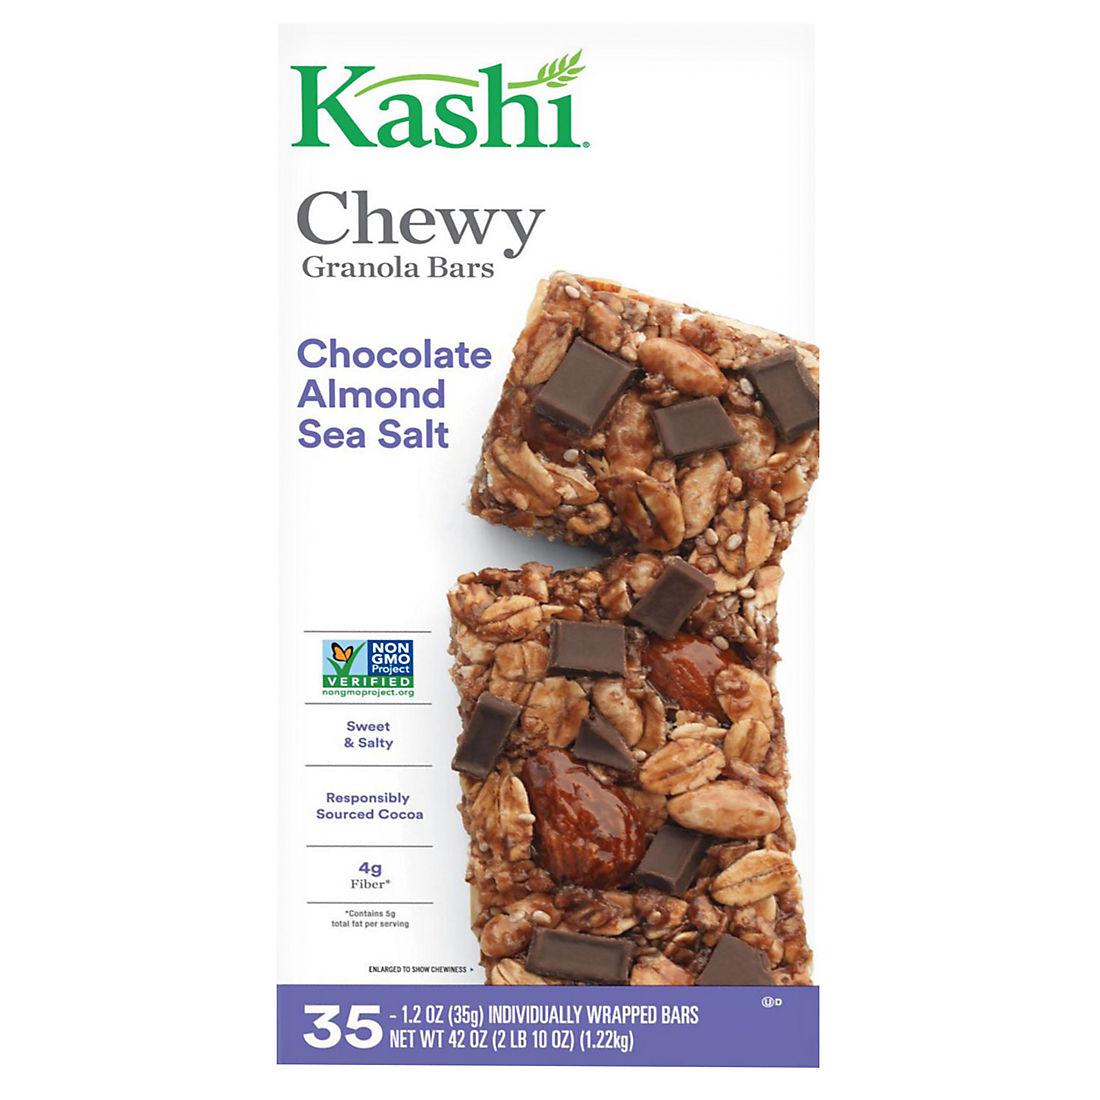 Kashi Chocolate Almond Sea Salt Chewy Granola Bars, 35 ct /1 2 oz